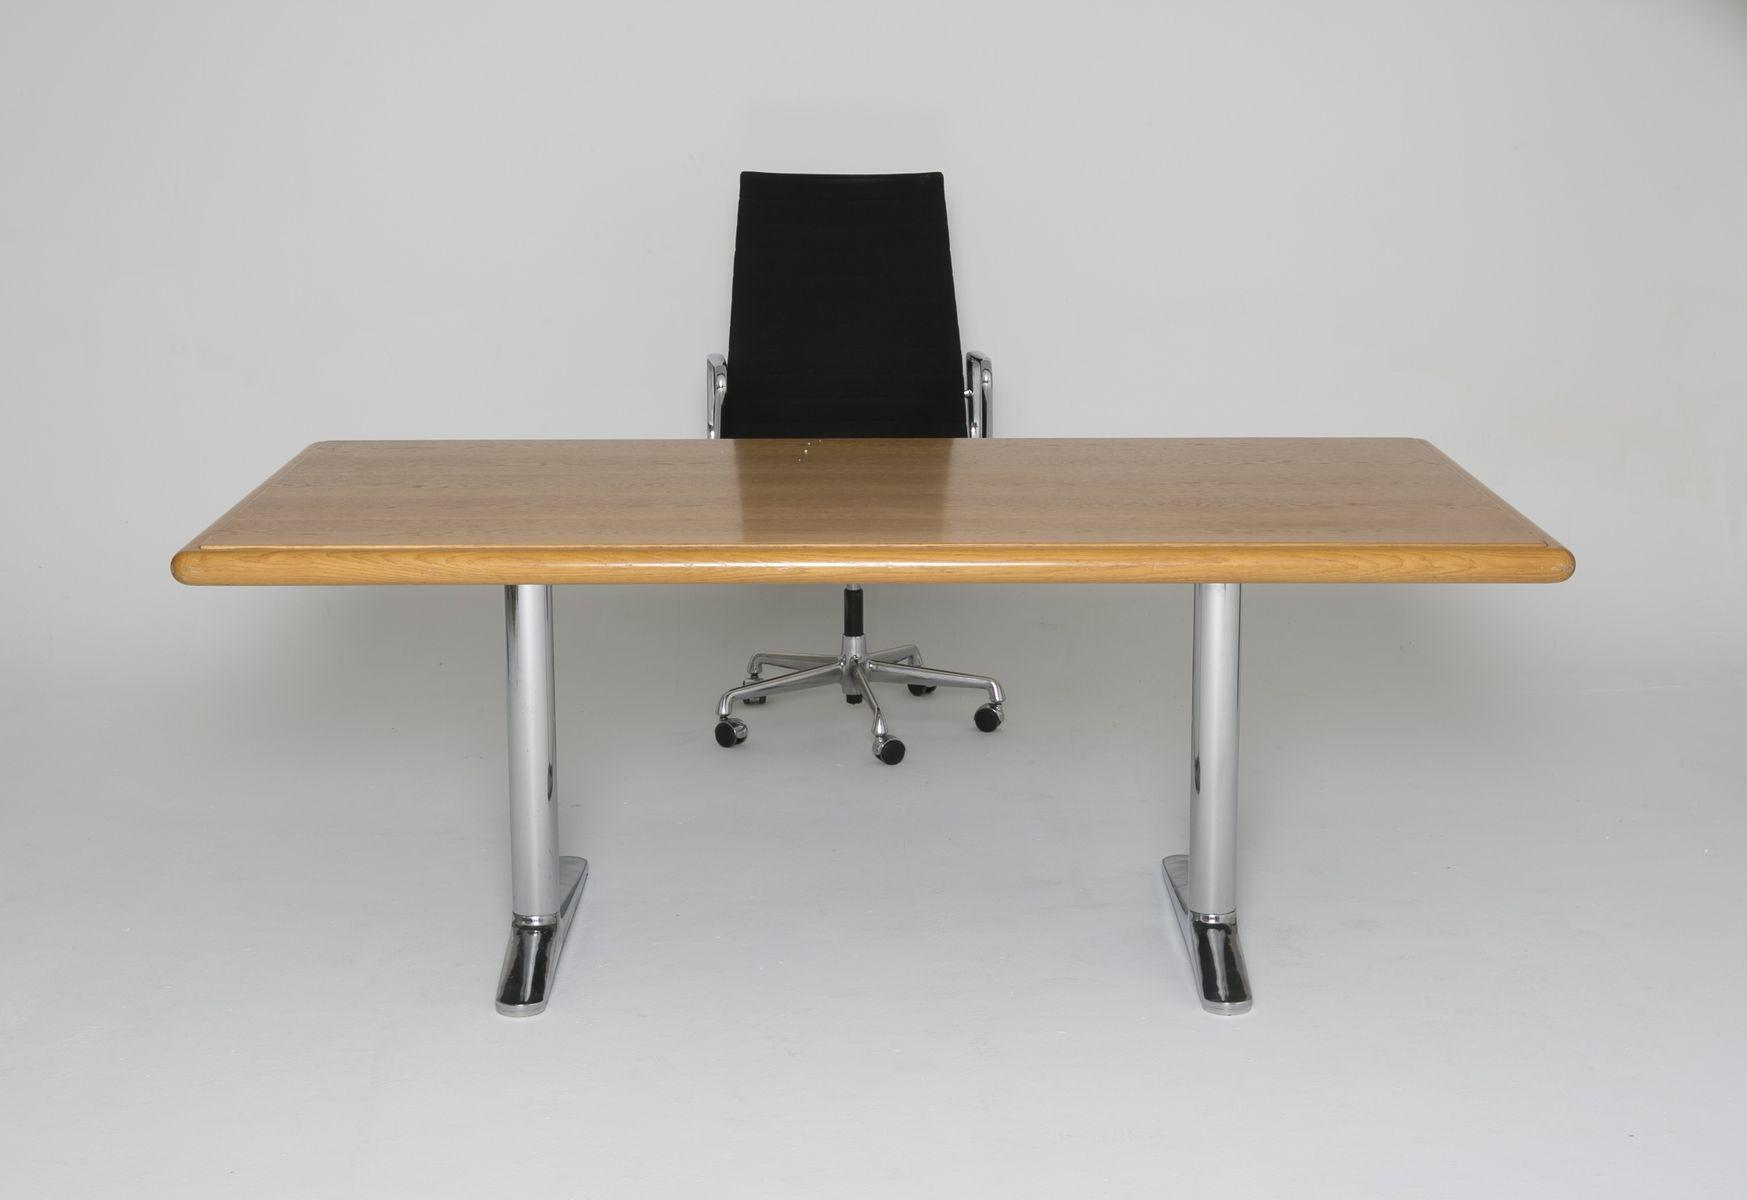 bureau vintage par warren platner pour knoll en vente sur. Black Bedroom Furniture Sets. Home Design Ideas